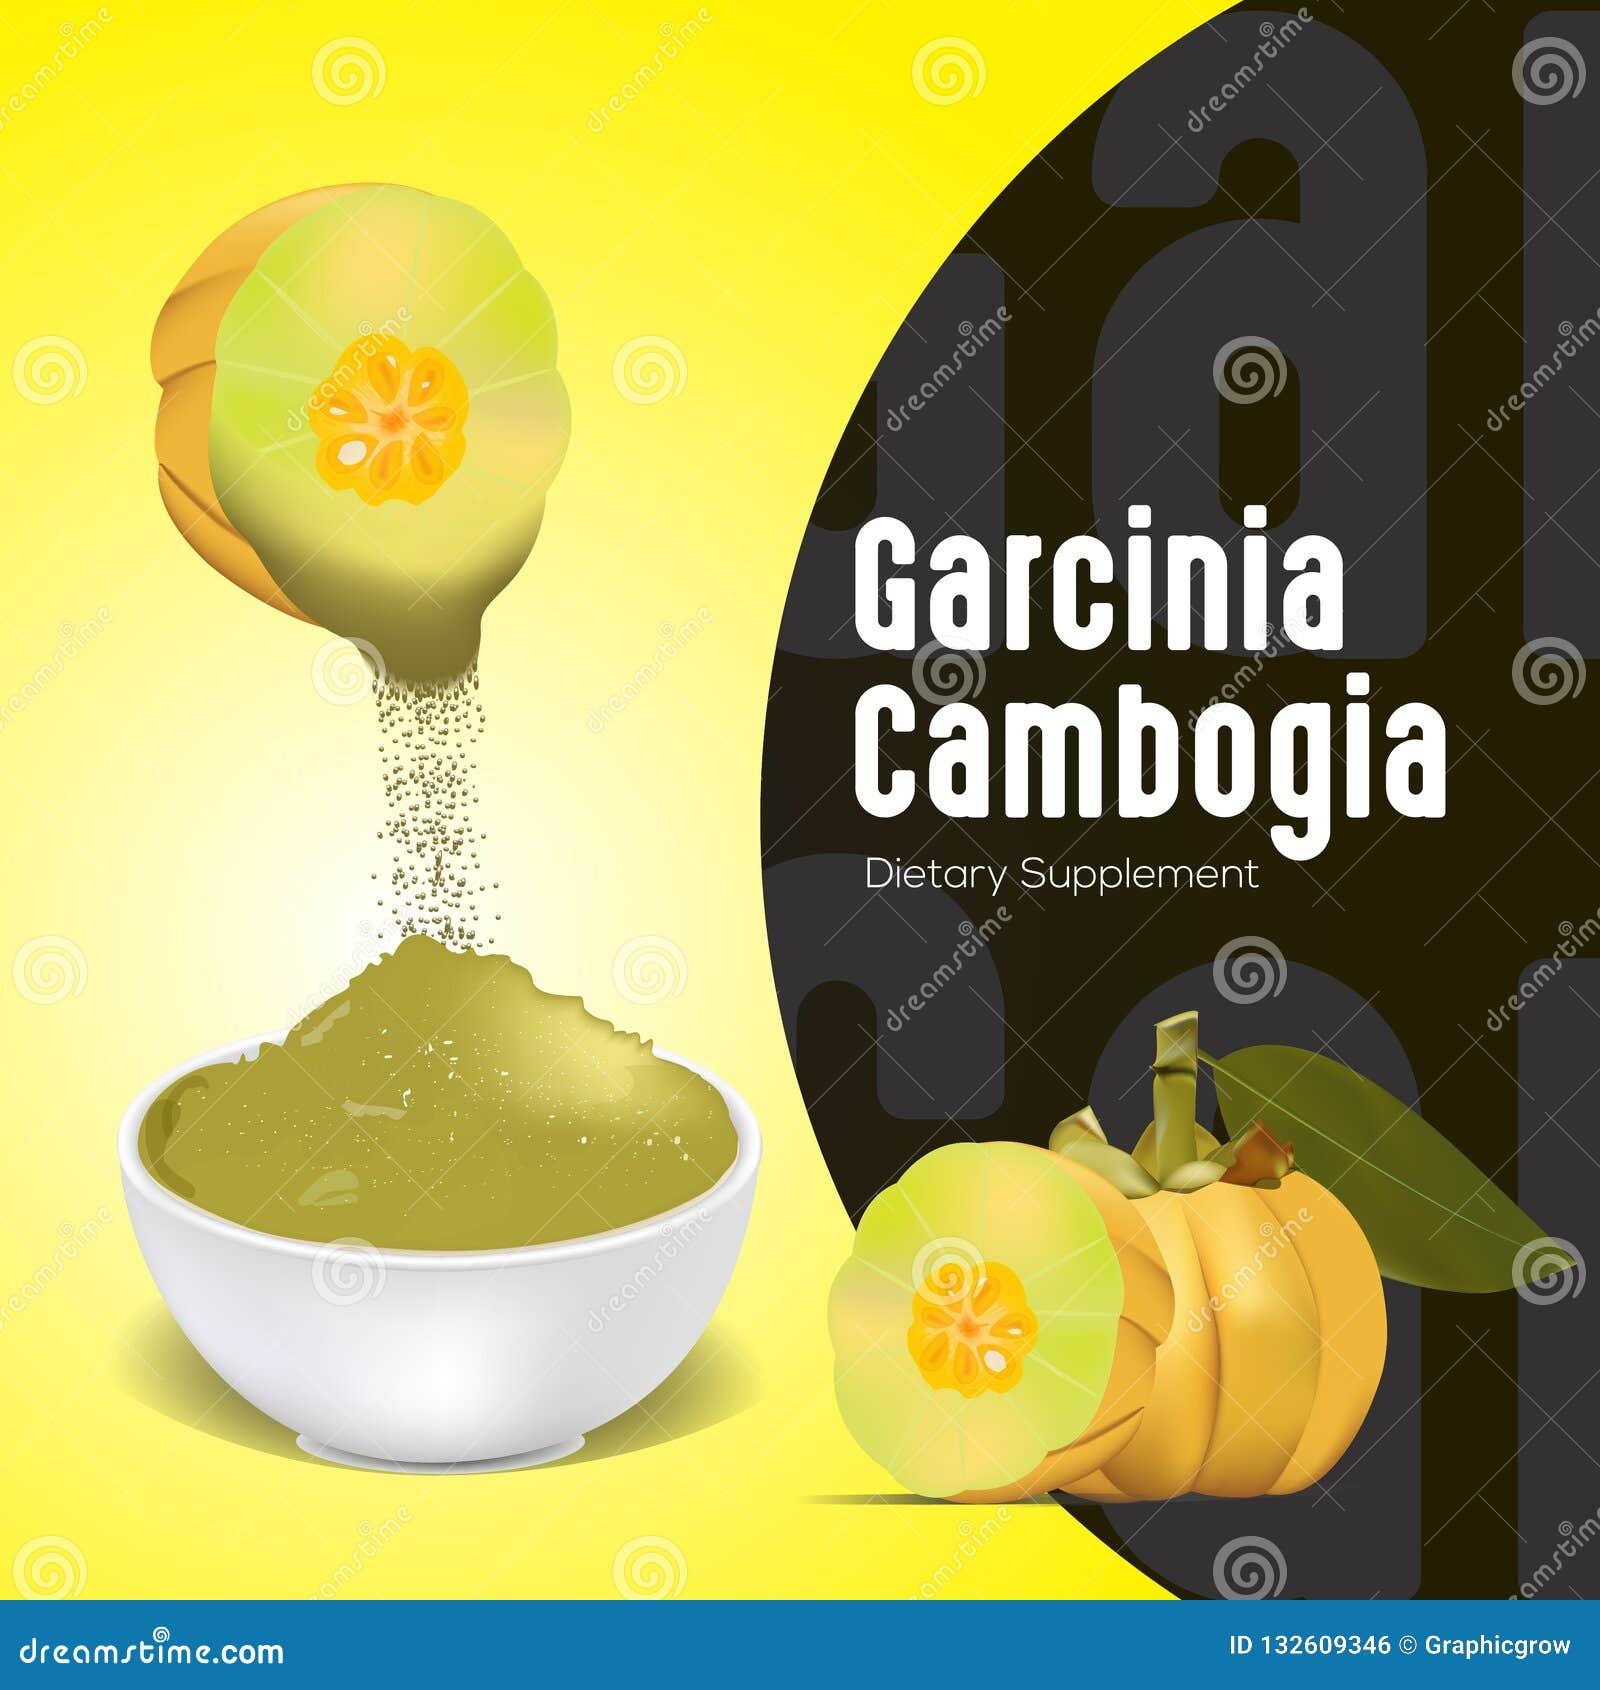 Garcinia Cambogia Fruit Powder For Supplement Stock Vector Illustration Of Fruit Cambogia 132609346